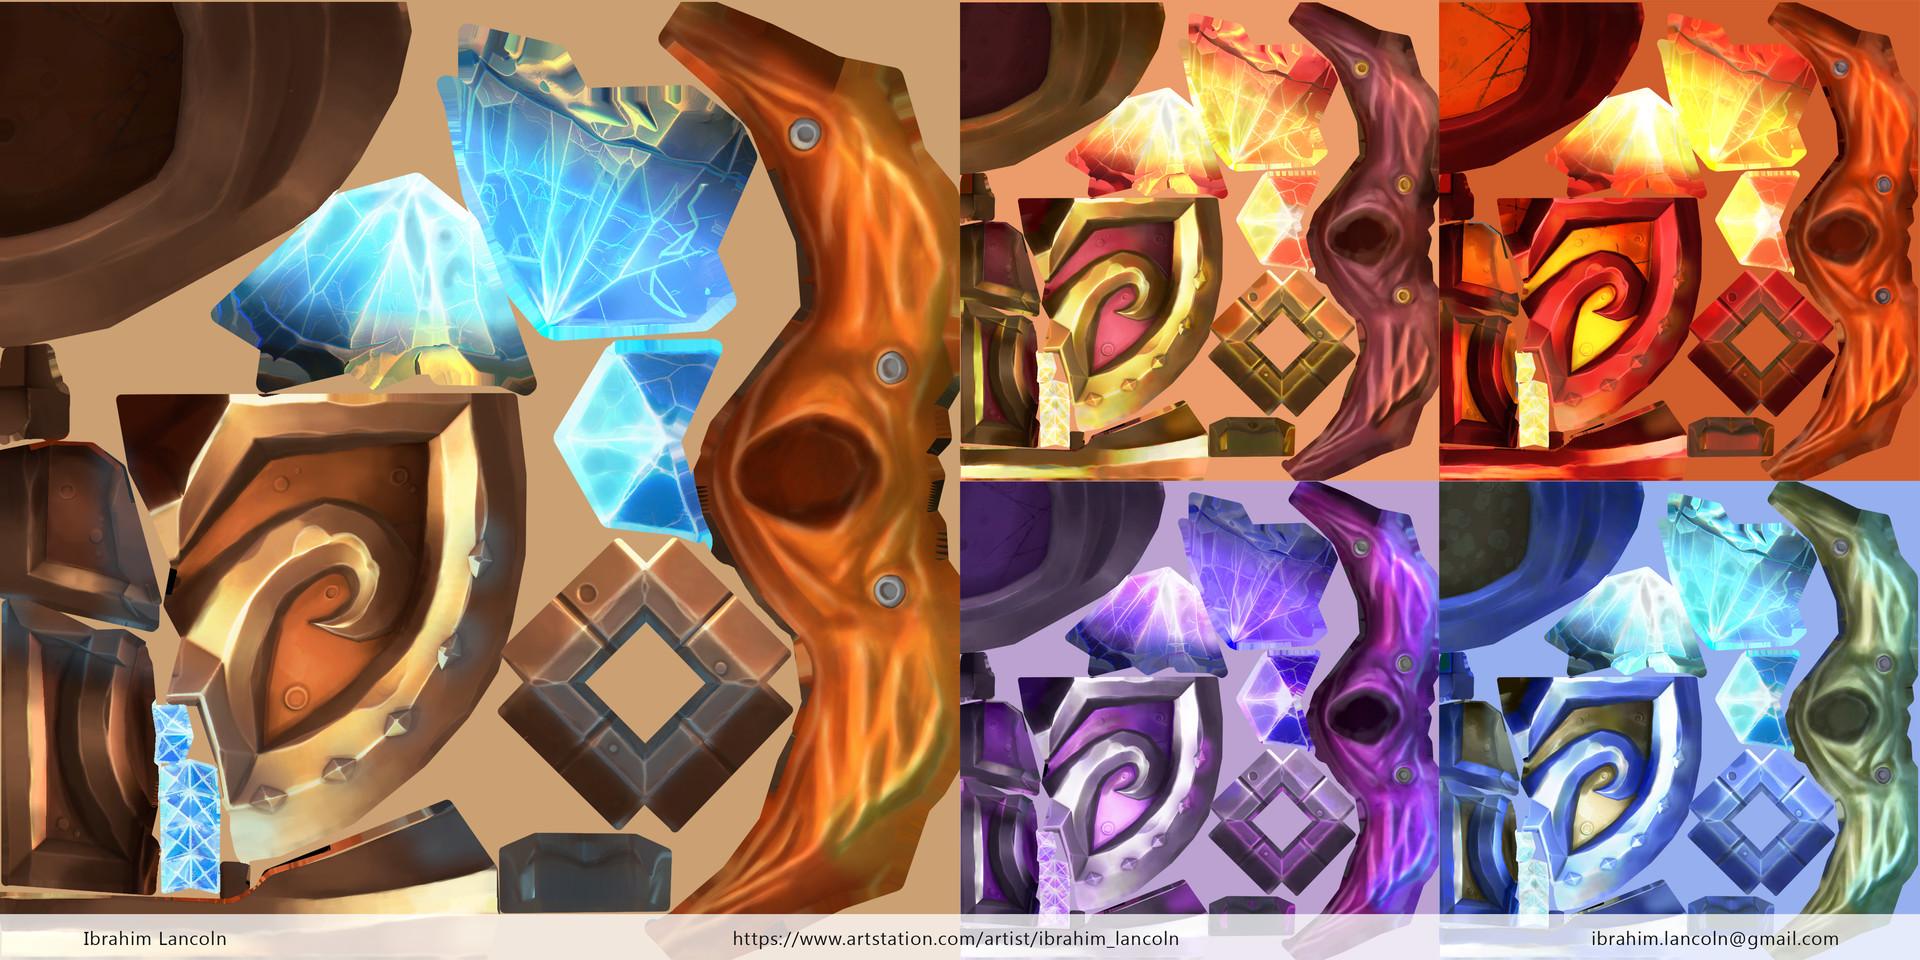 Ibrahim lancoln wc artstation textures